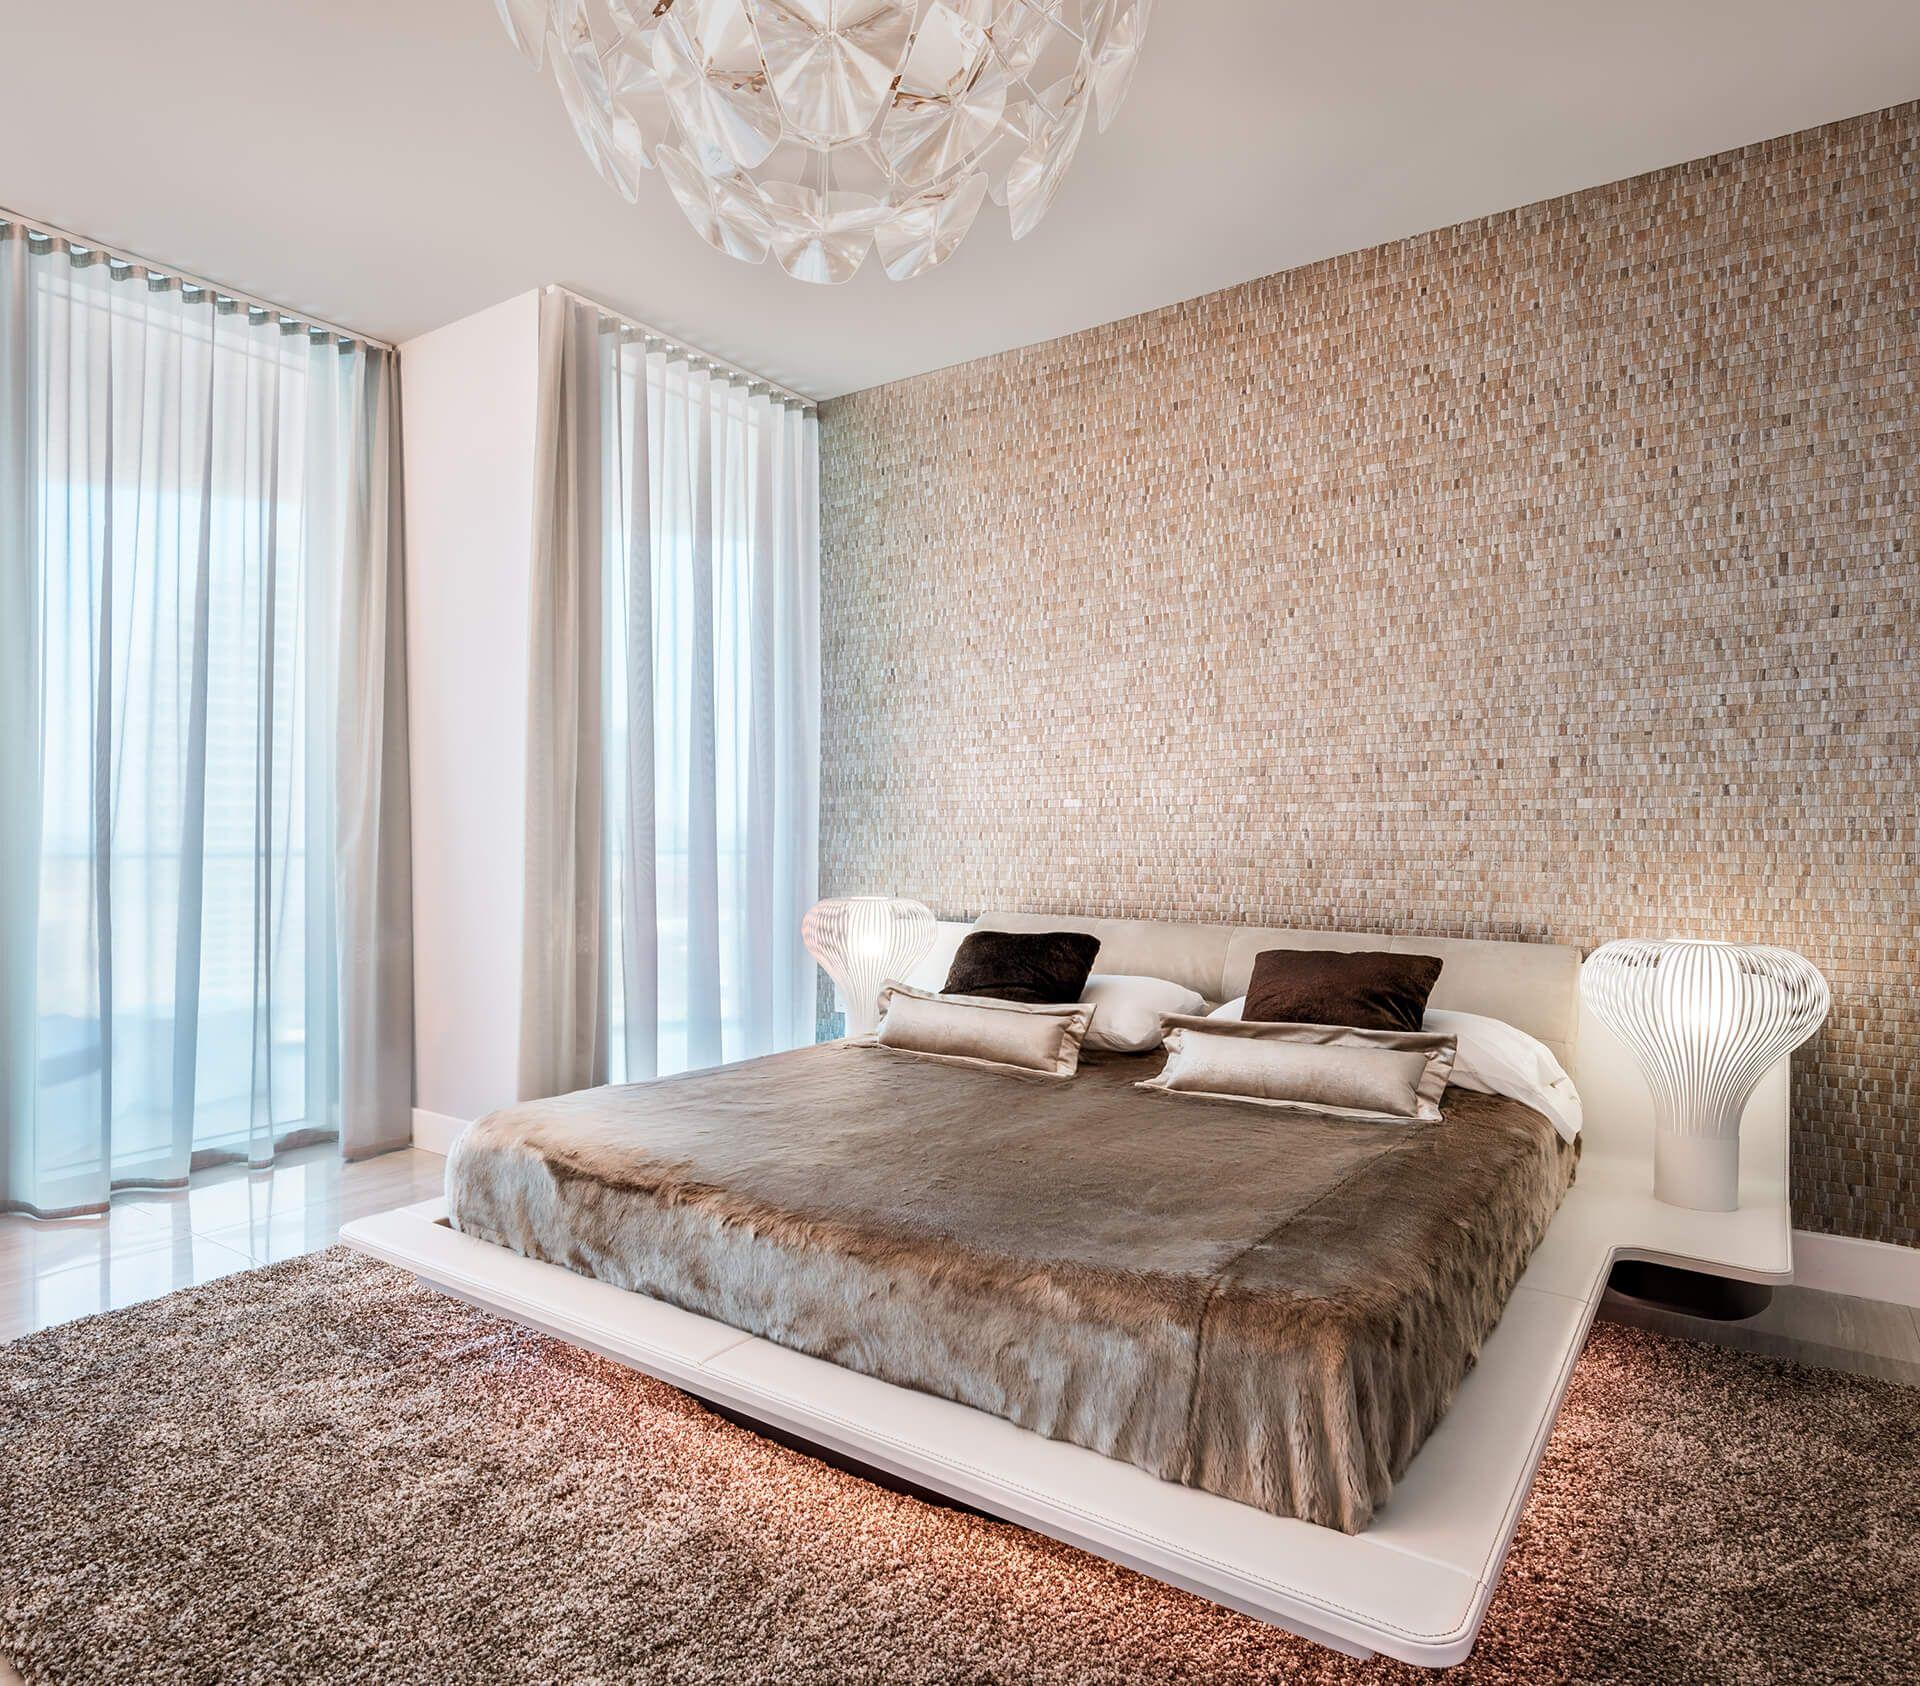 Serene Minimalist Bedroom Nomad Wallcoverings By Omexco Interior Design Dawn Elise Interiors Www Dawneliseint Home Decor Interior Design Minimalist Bedroom